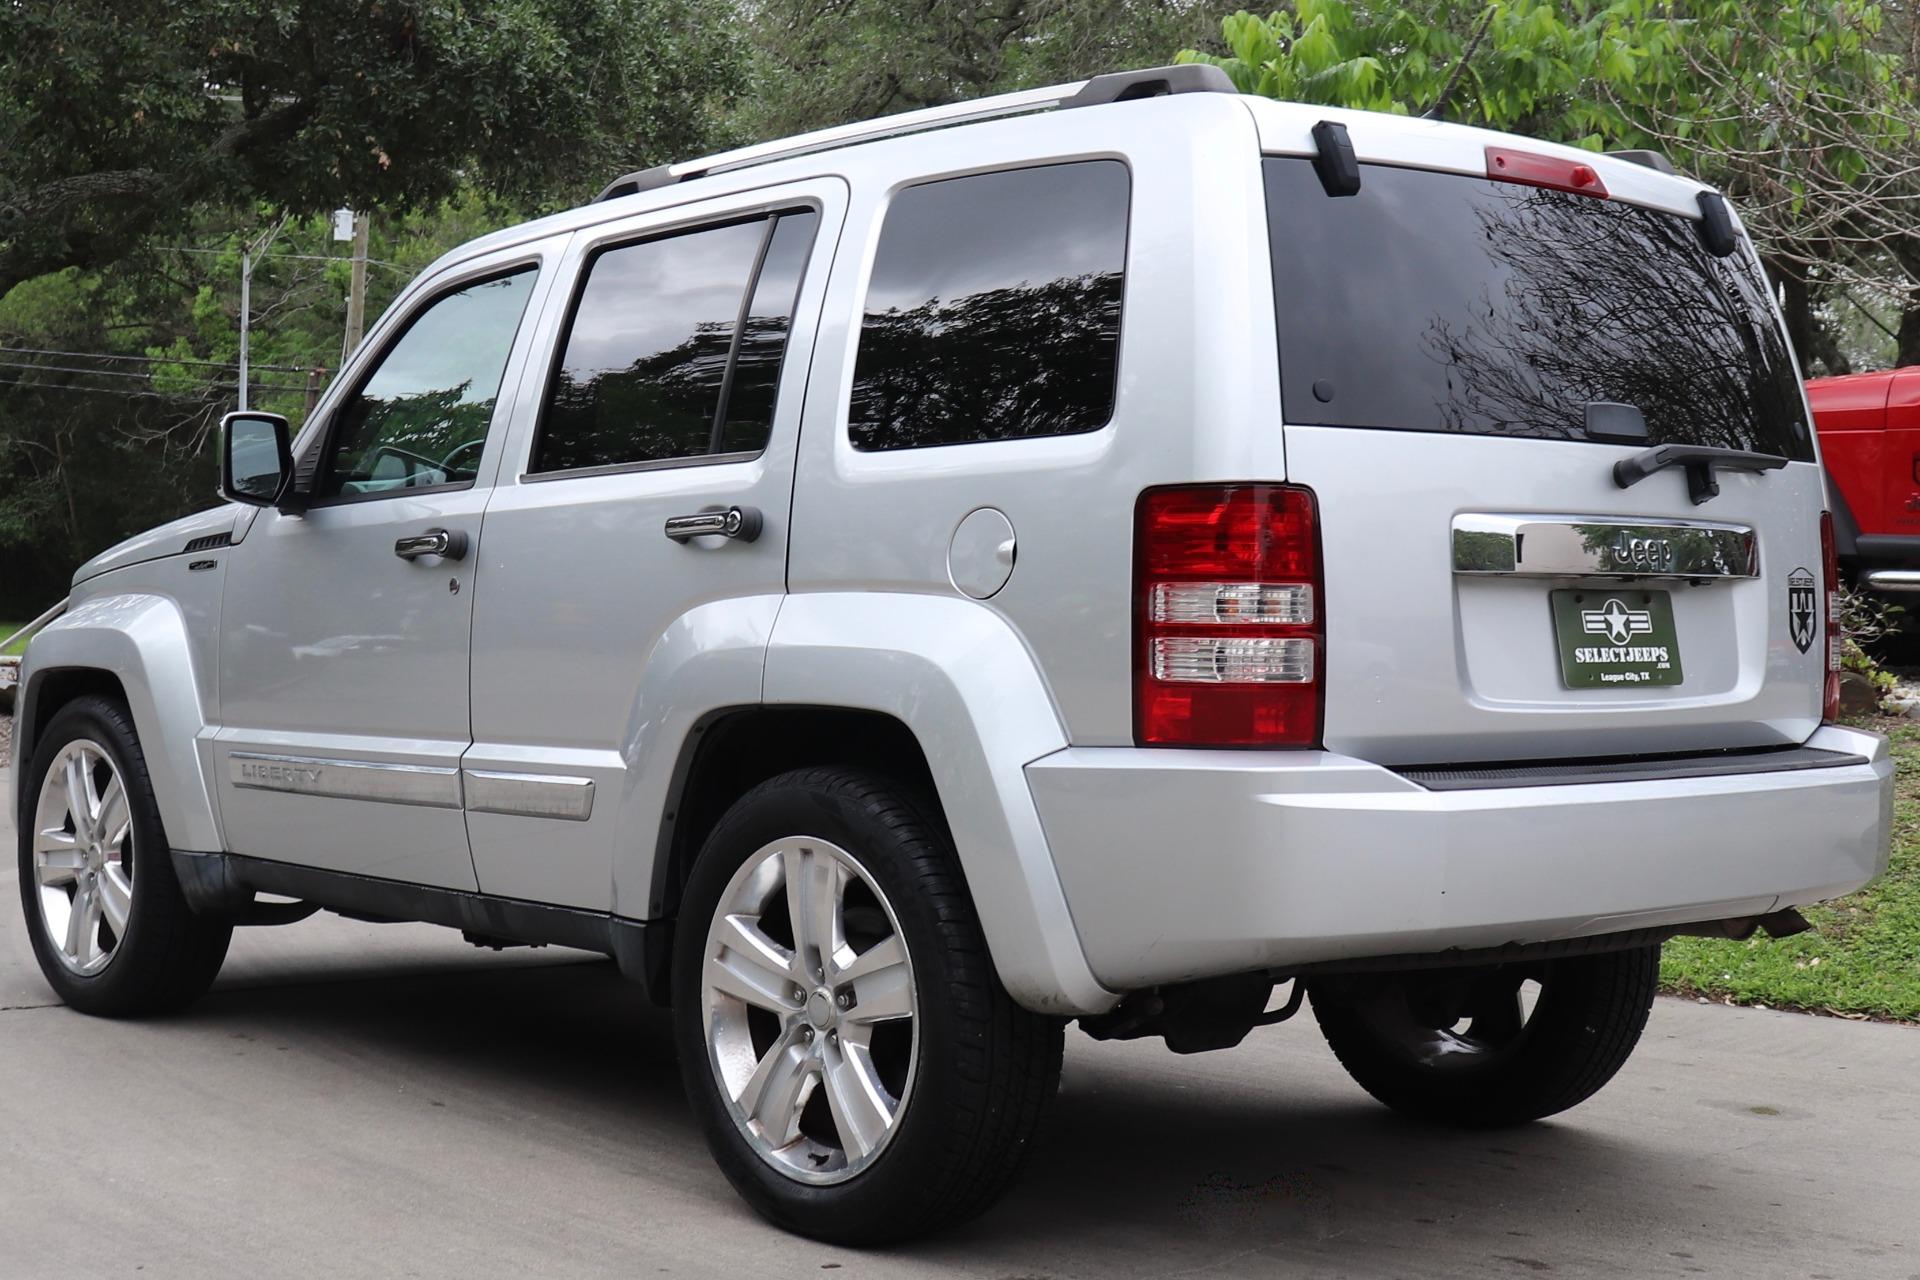 Used-2011-Jeep-Liberty-Sport-Jet